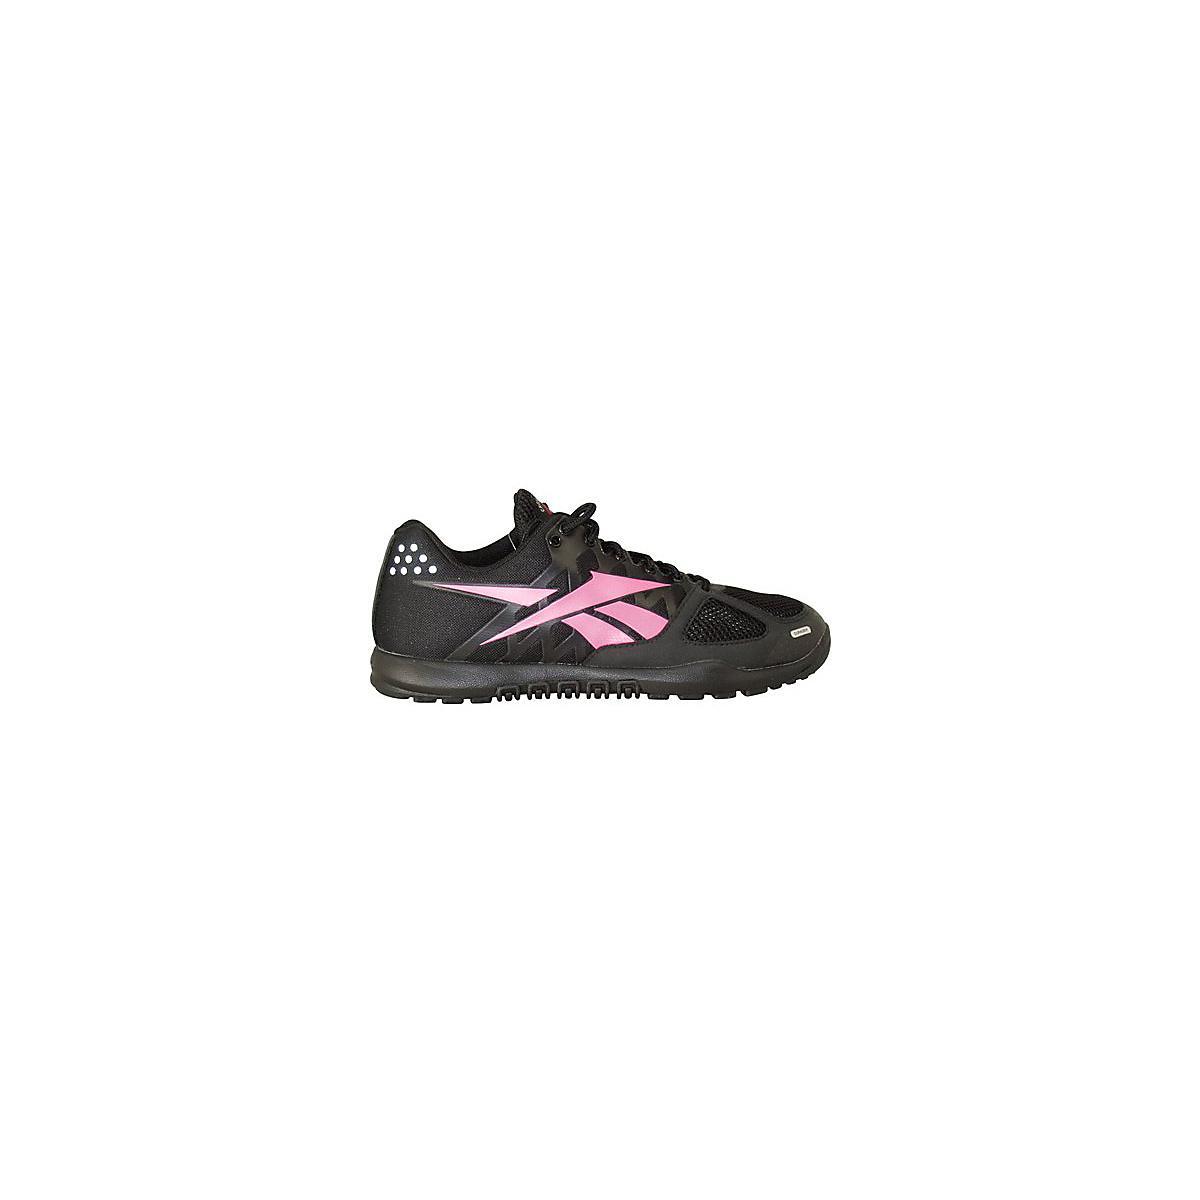 b651b477dabde3 Womens Reebok CrossFit Nano 2.0 Cross Training Shoe at Road Runner Sports